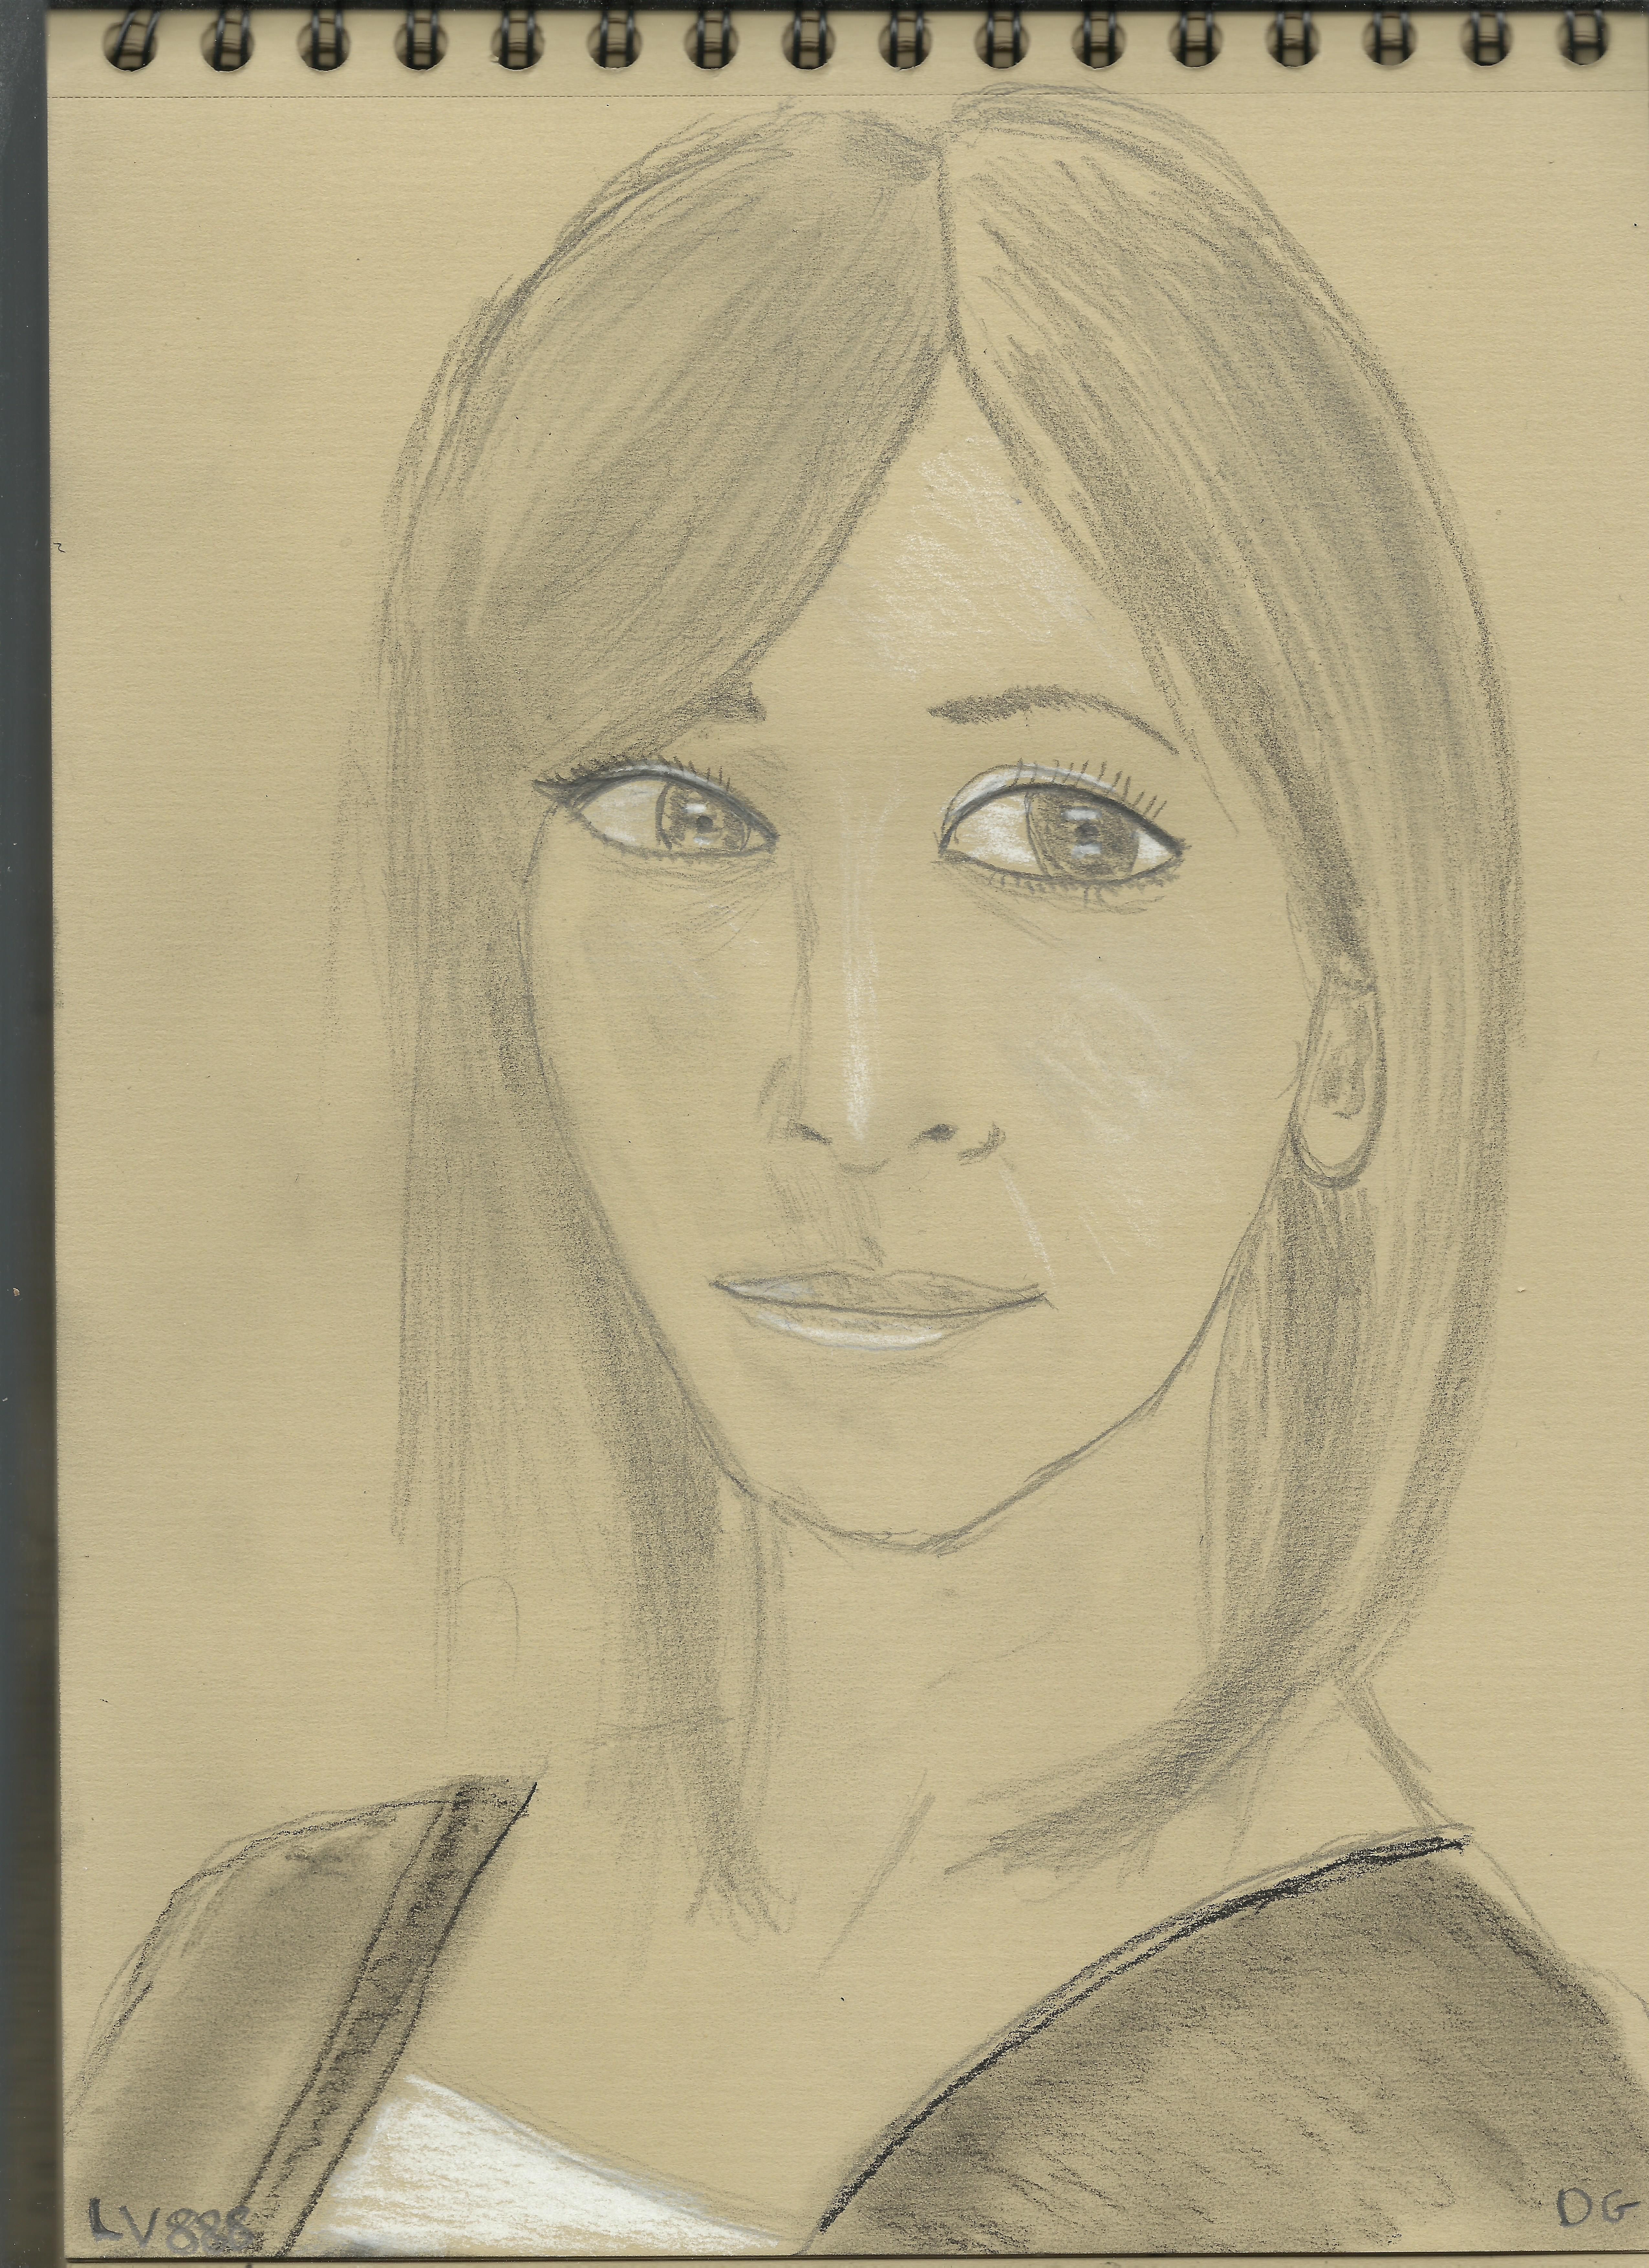 Kraft Test - Woman face study n105 by lv888